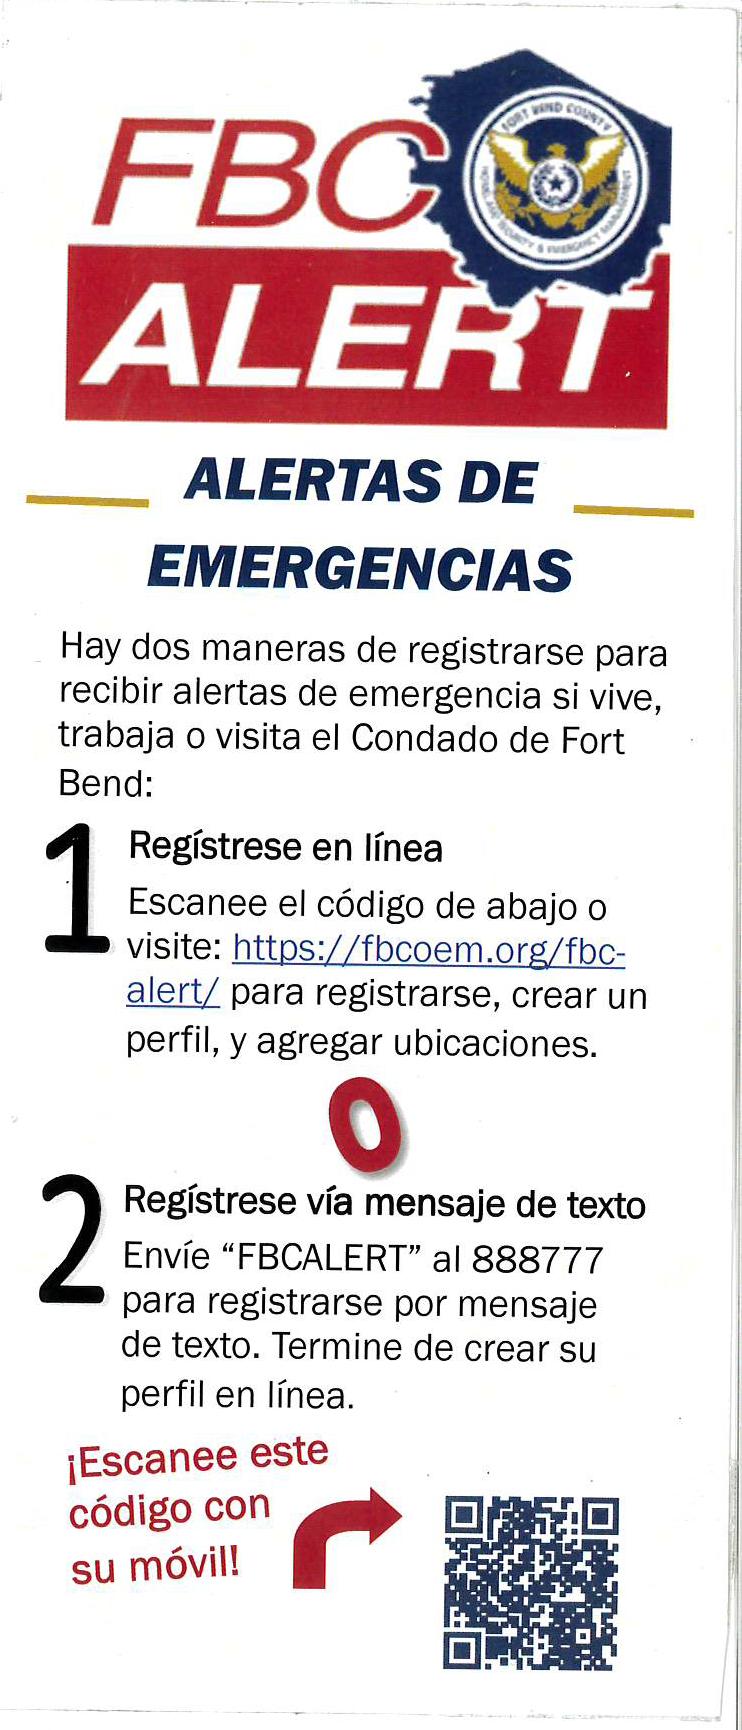 FBC Alertas De Emergencias